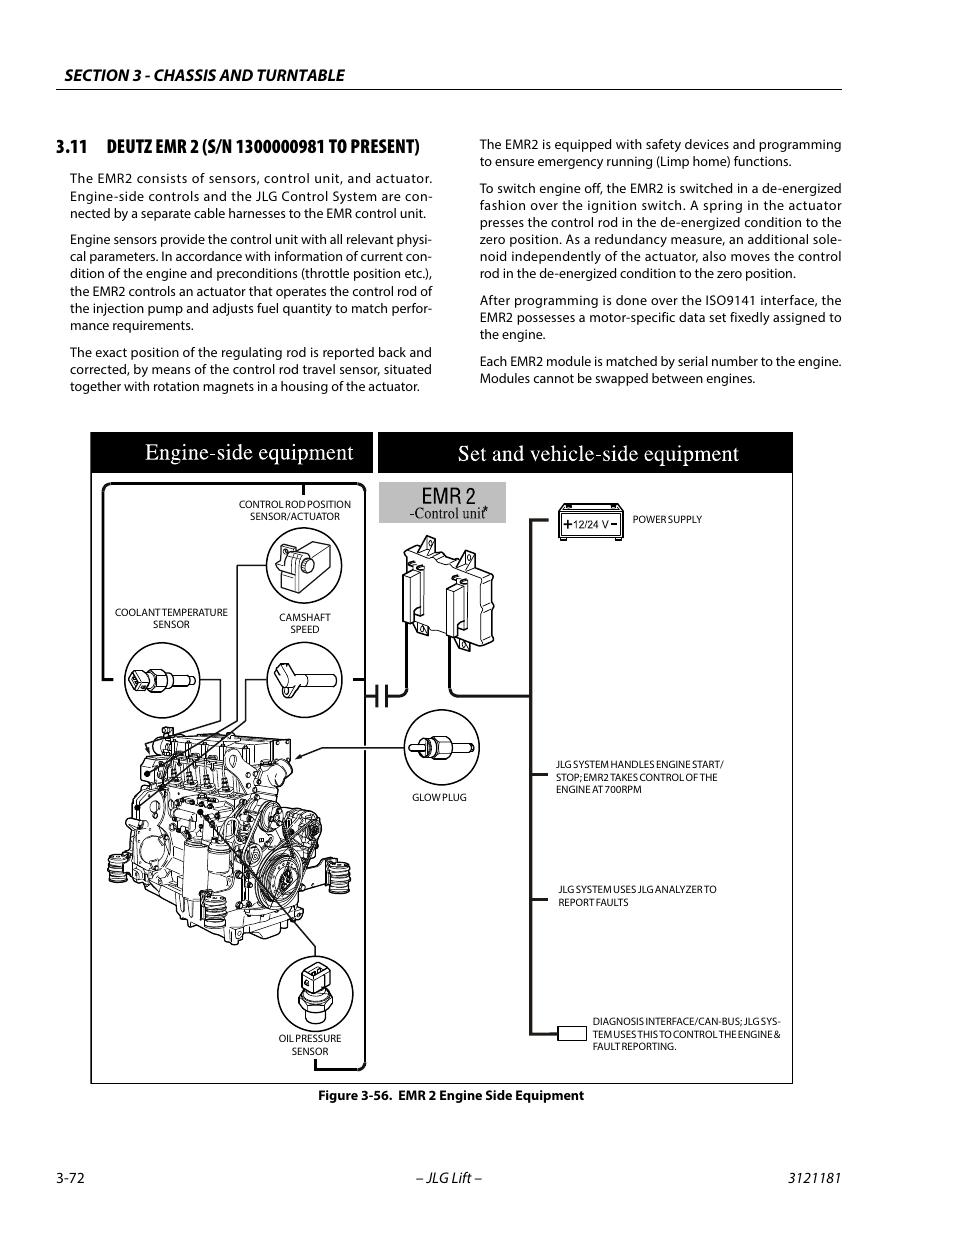 11 deutz emr 2 s n 1300000981 to present deutz emr 2 s n rh manualsdir com Deutz Repair Manual Deutz Tractor Manuals